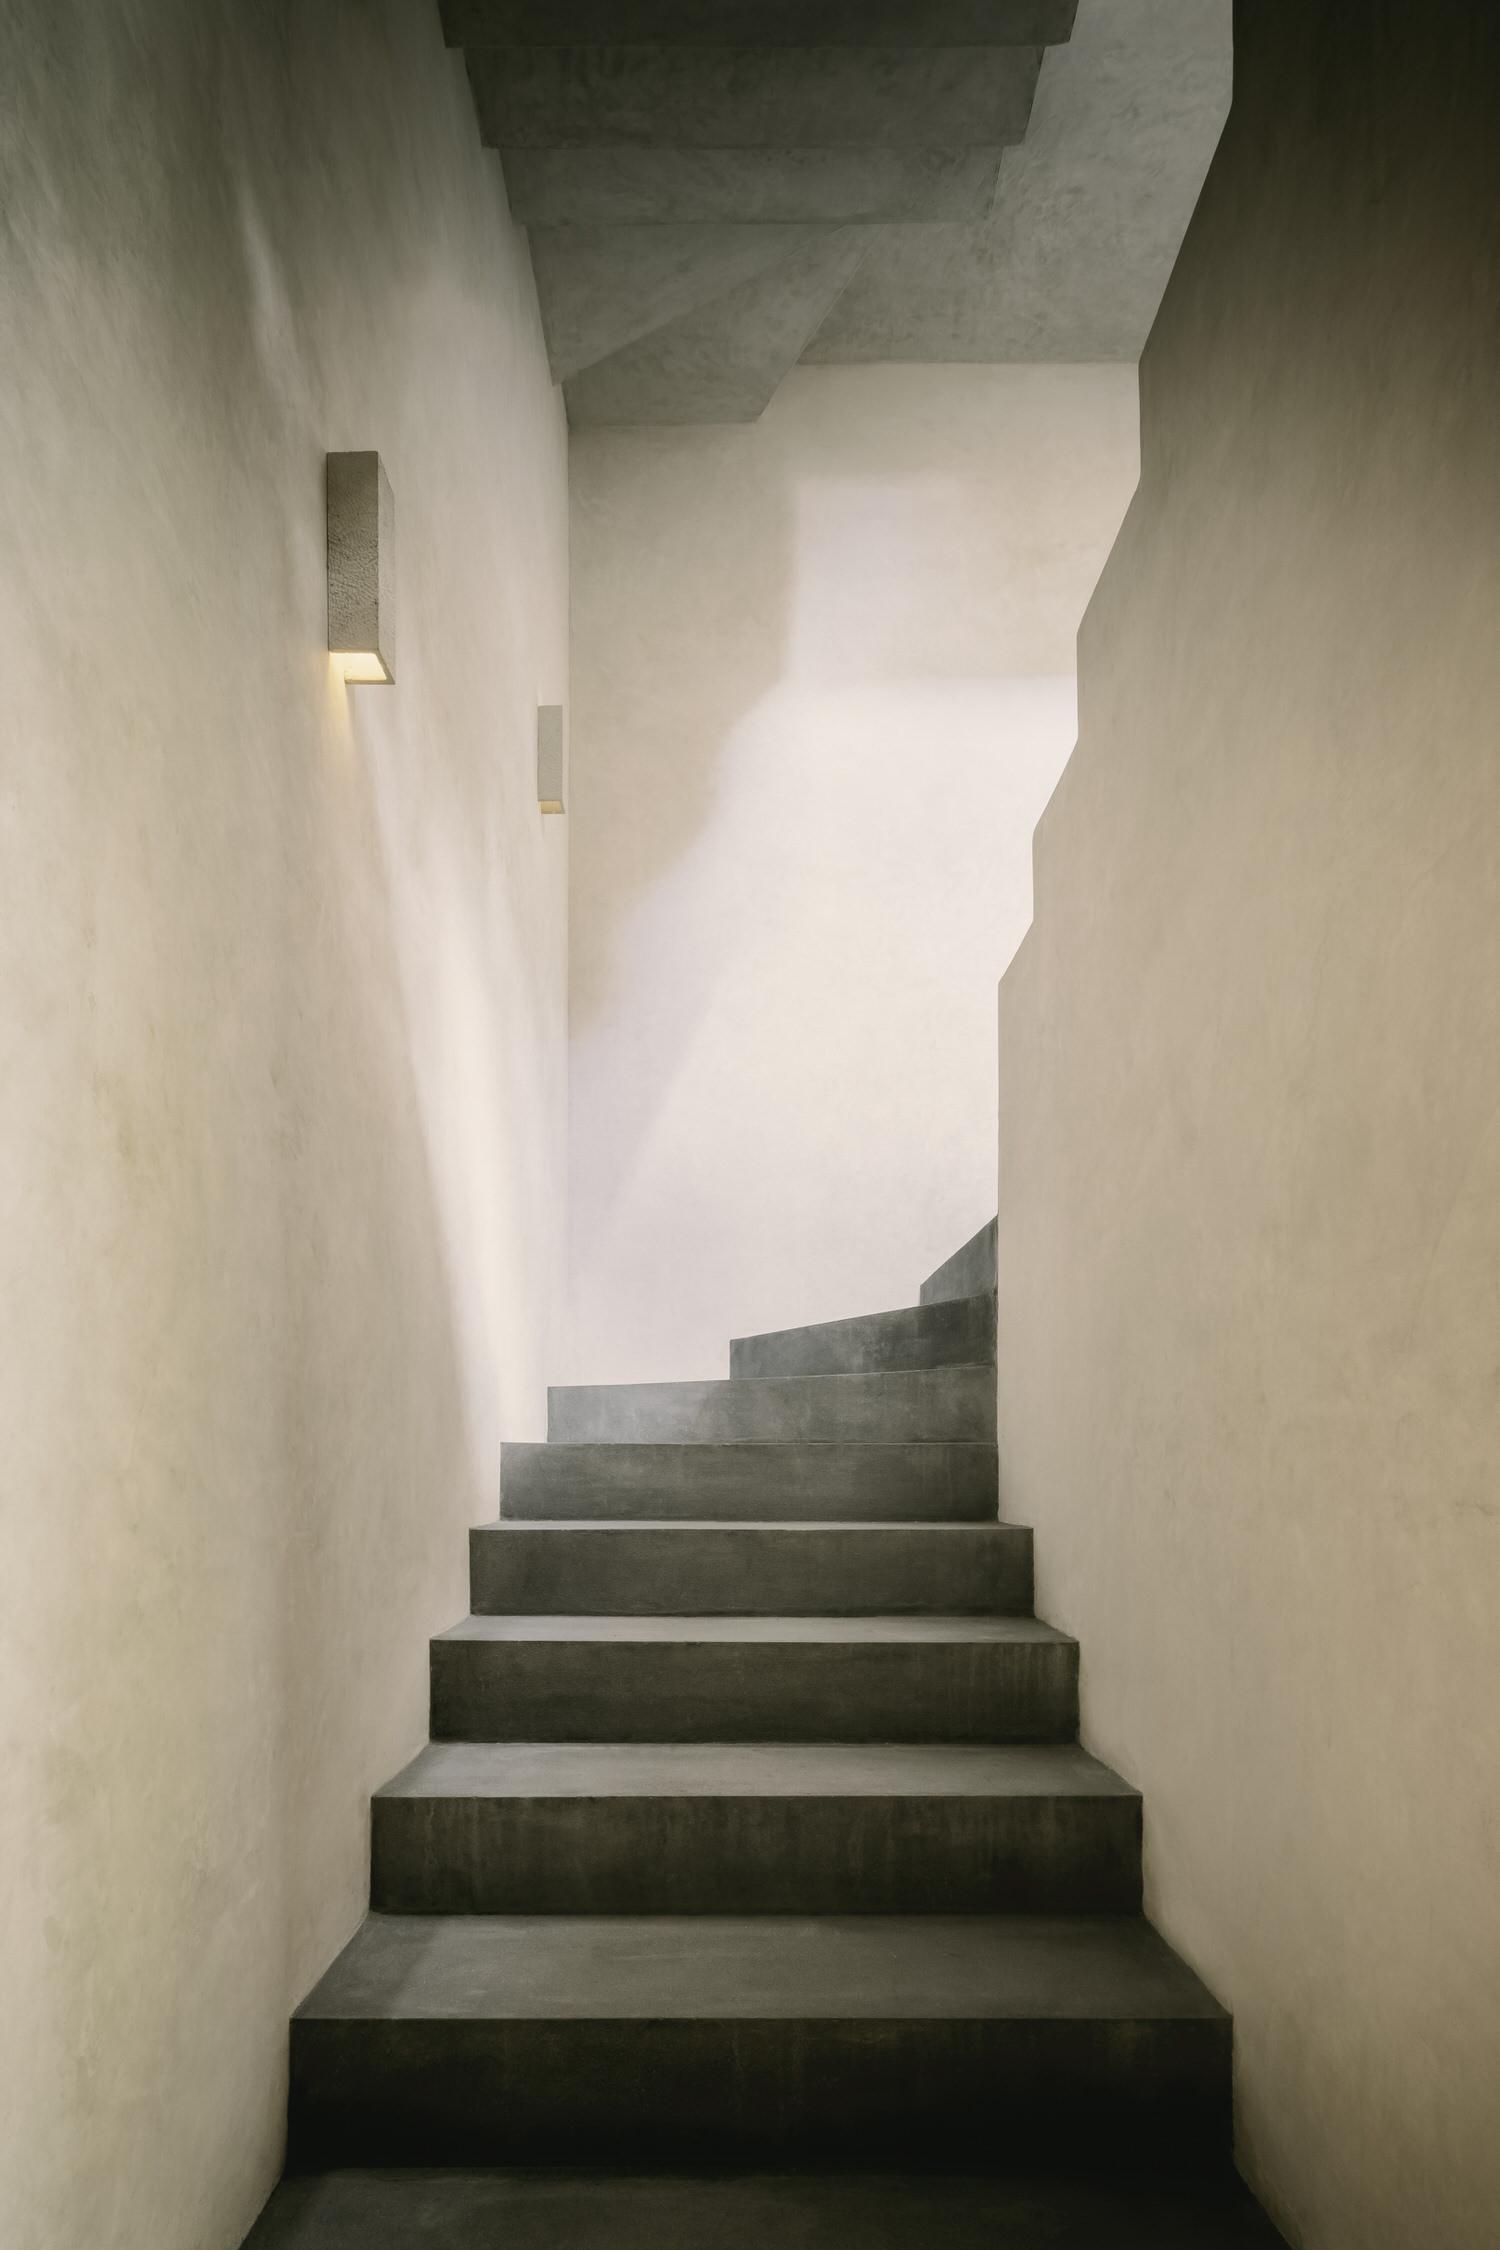 Co Lab Design Office Aviv House Tulum Mexico Arxhitecture Photo Cesar Bejar Yellowtrace 16